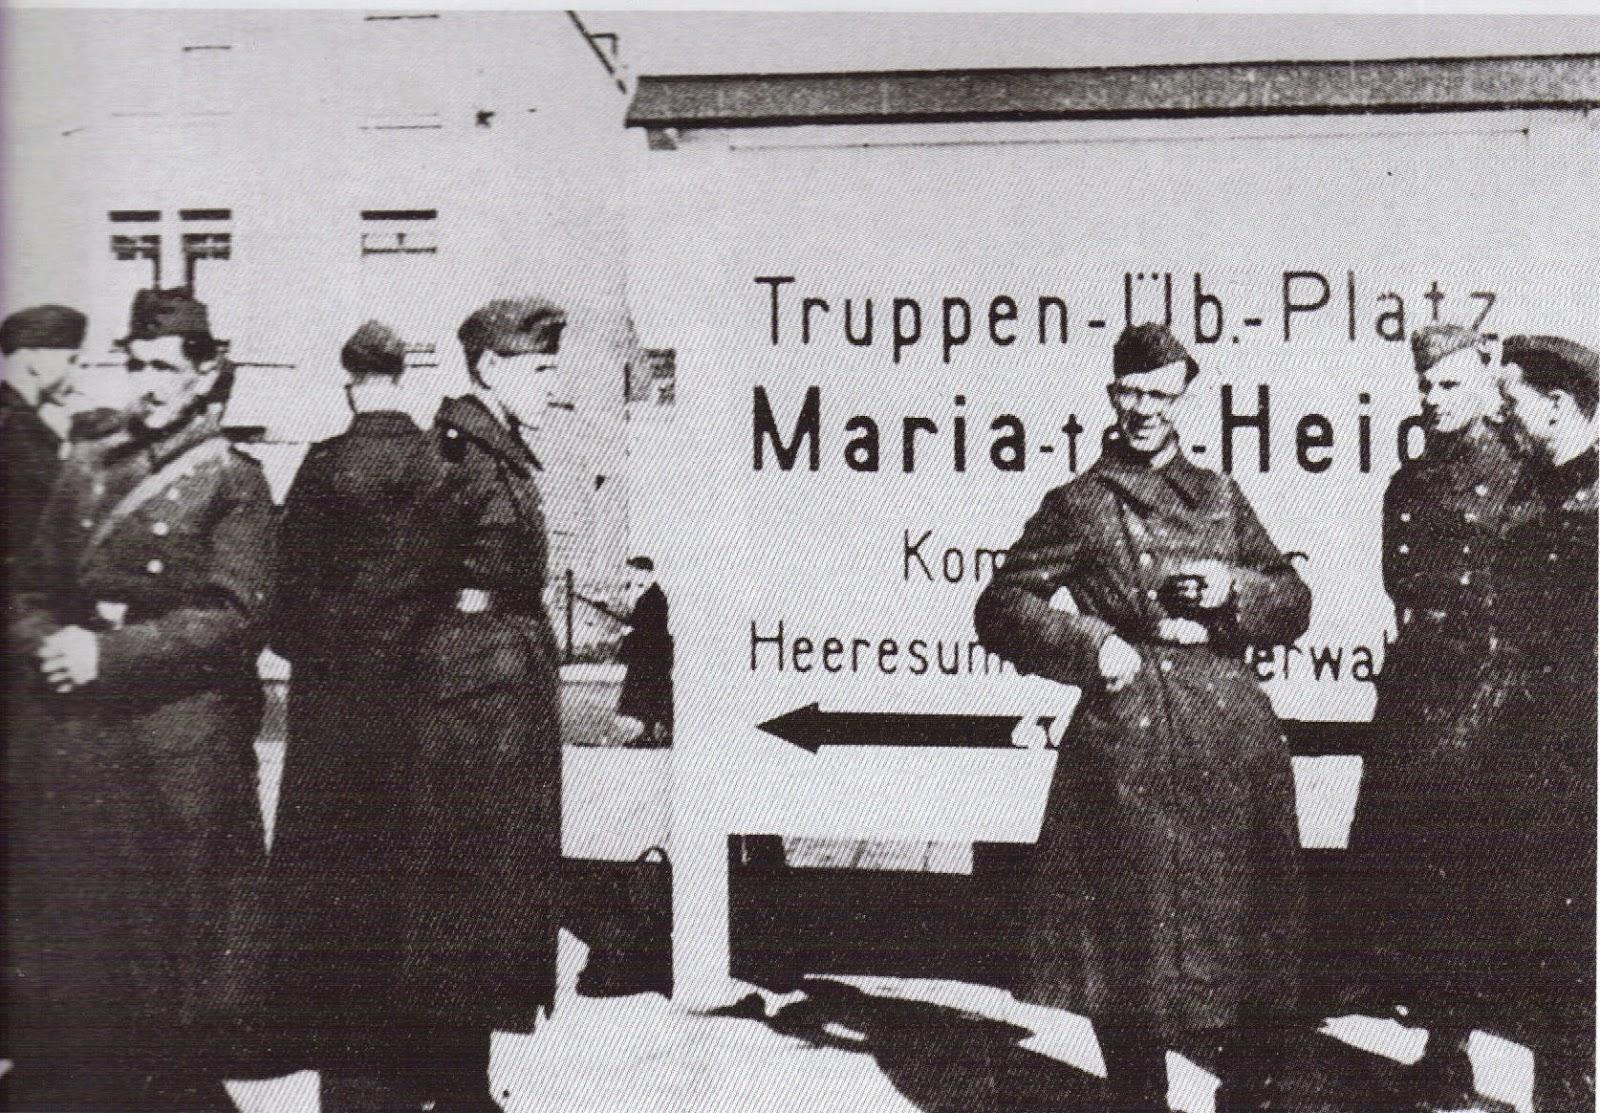 Foto 44 infanterie division reichsgrenadier division for Division 2 table 98 99